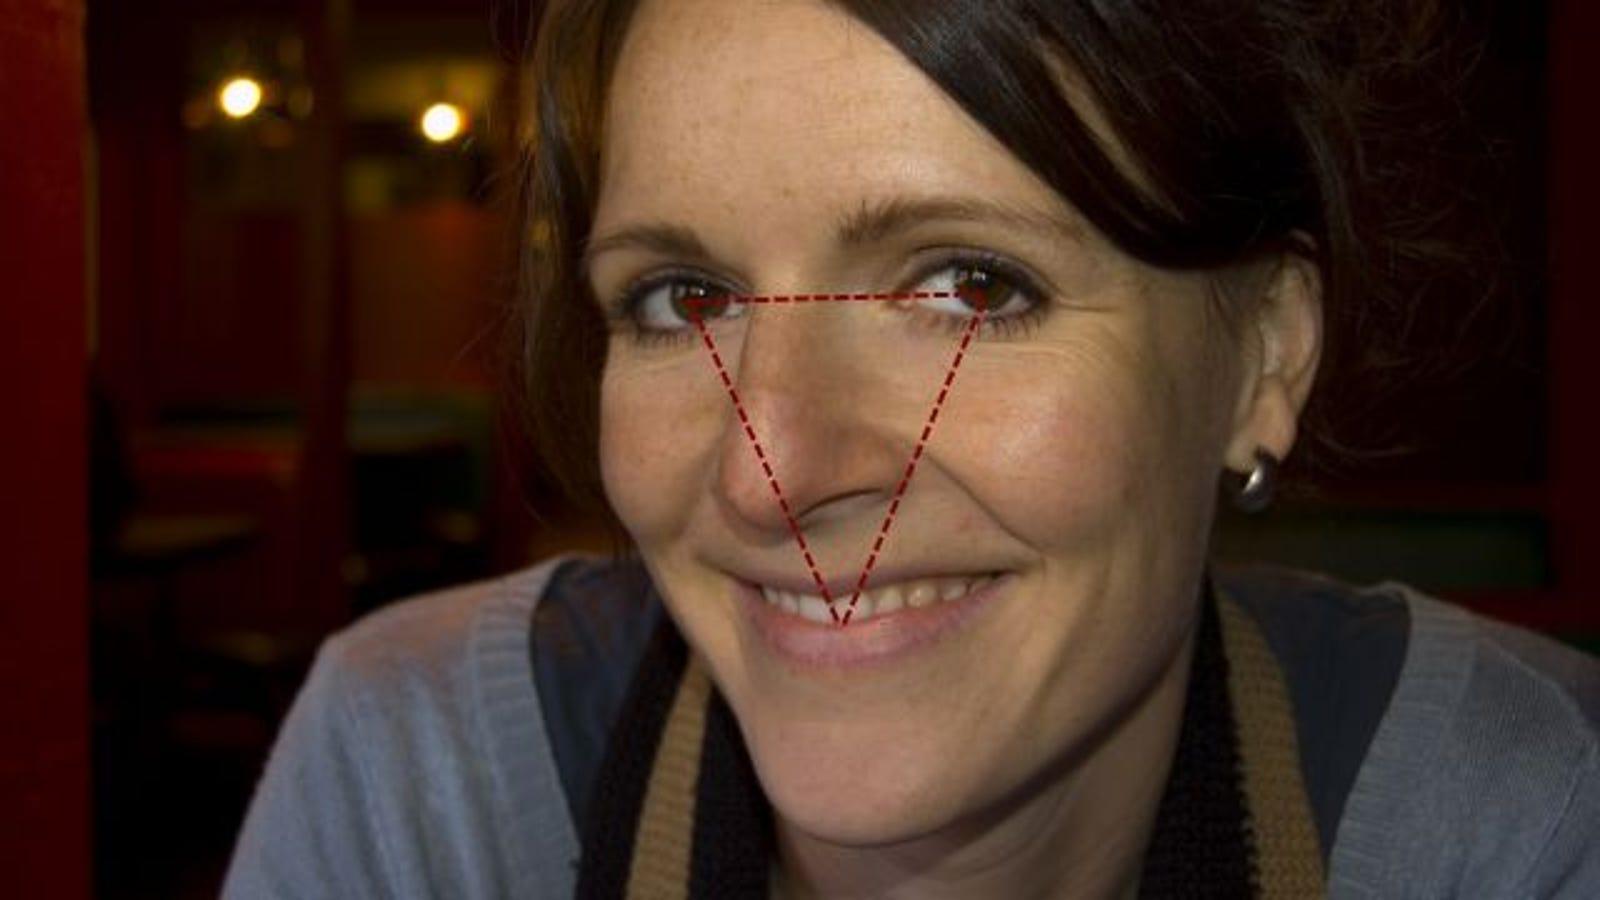 triangular gazing